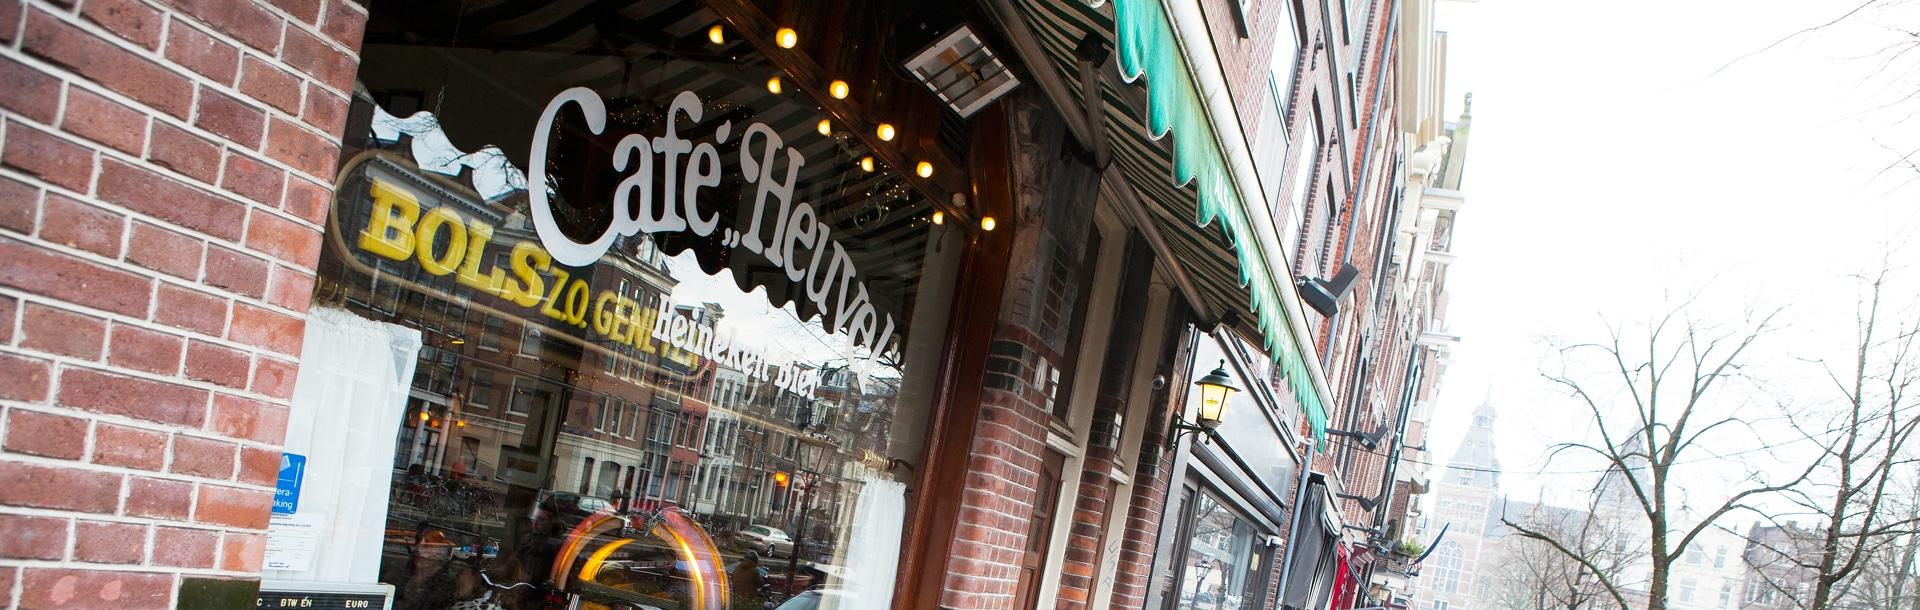 Cafe_Heuvel_Nice2know_Locatie